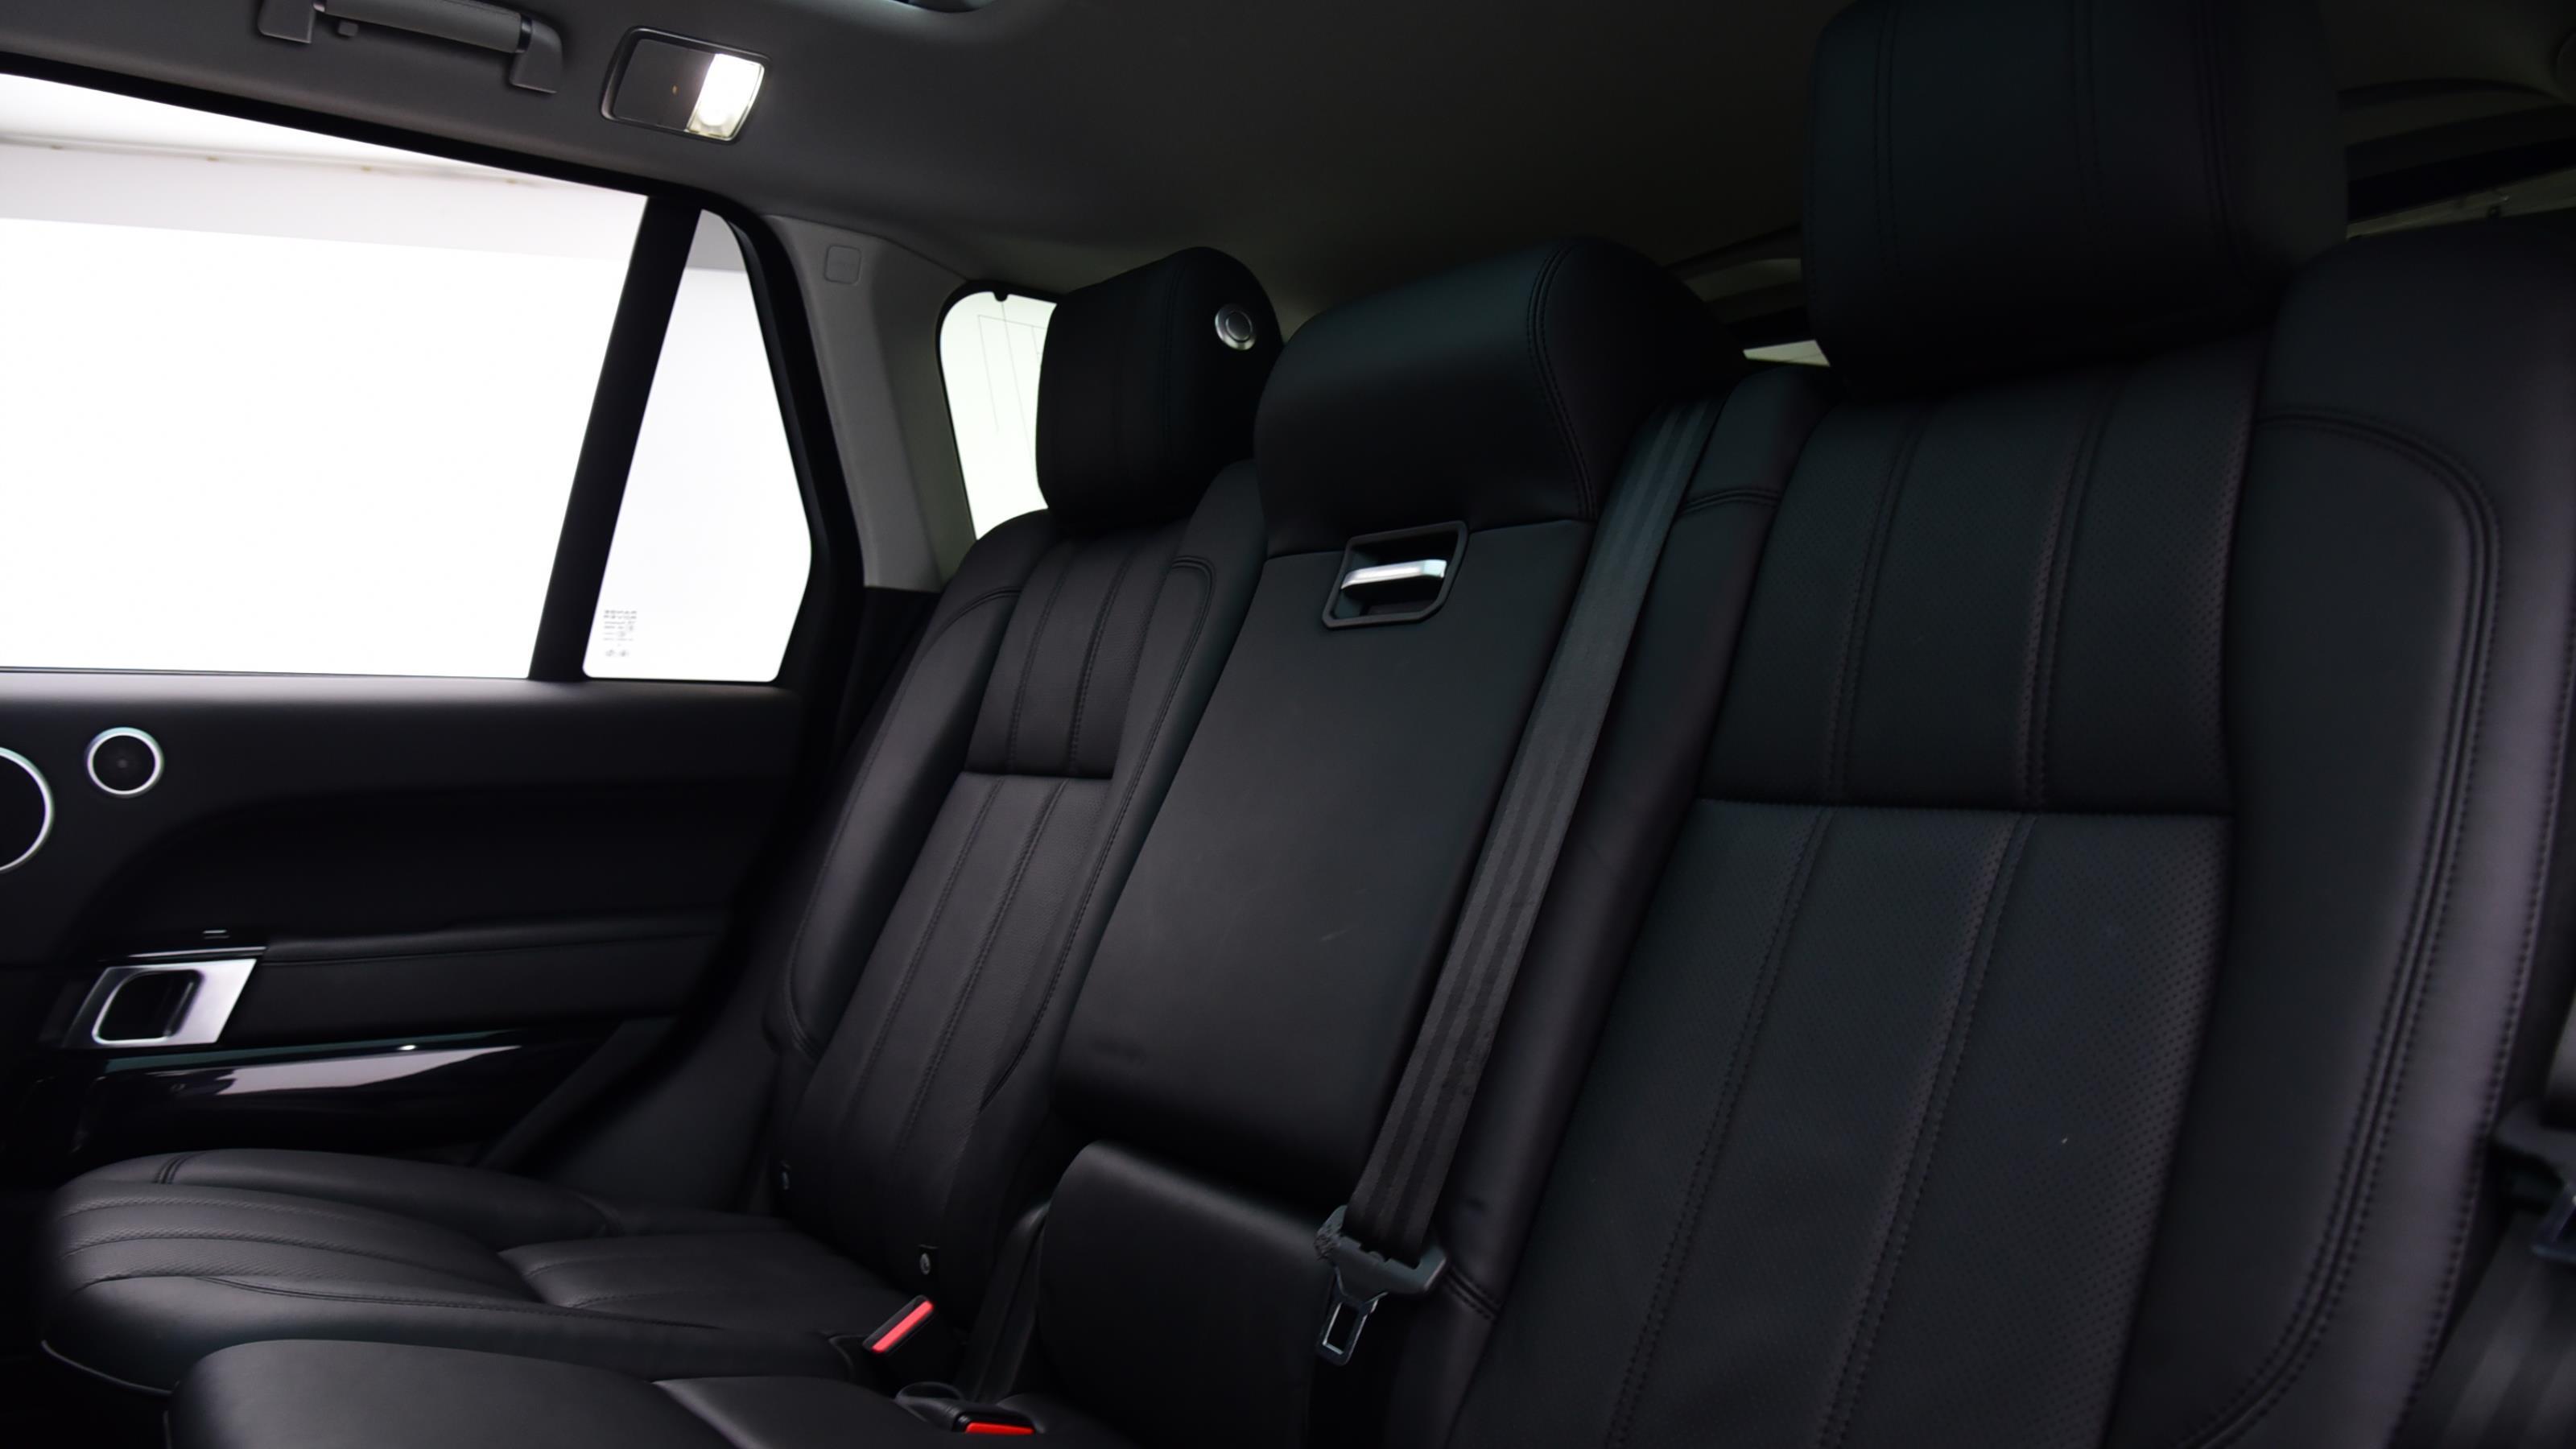 Used 2017 Land Rover RANGE ROVER 3.0 TDV6 Vogue 4dr Auto GREY at Saxton4x4